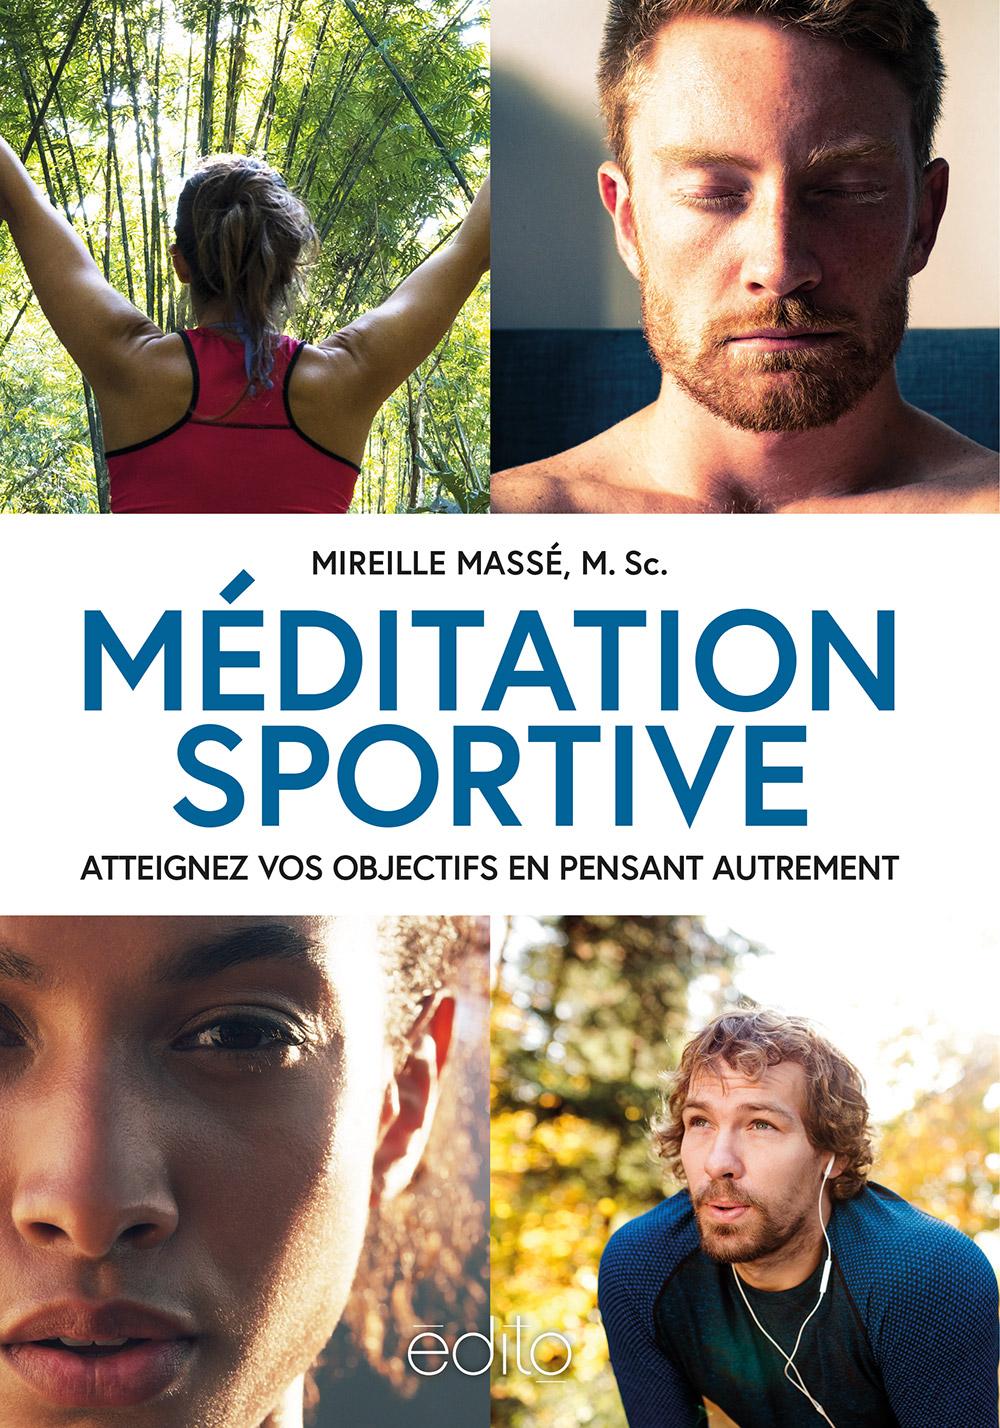 Méditation sportive Image